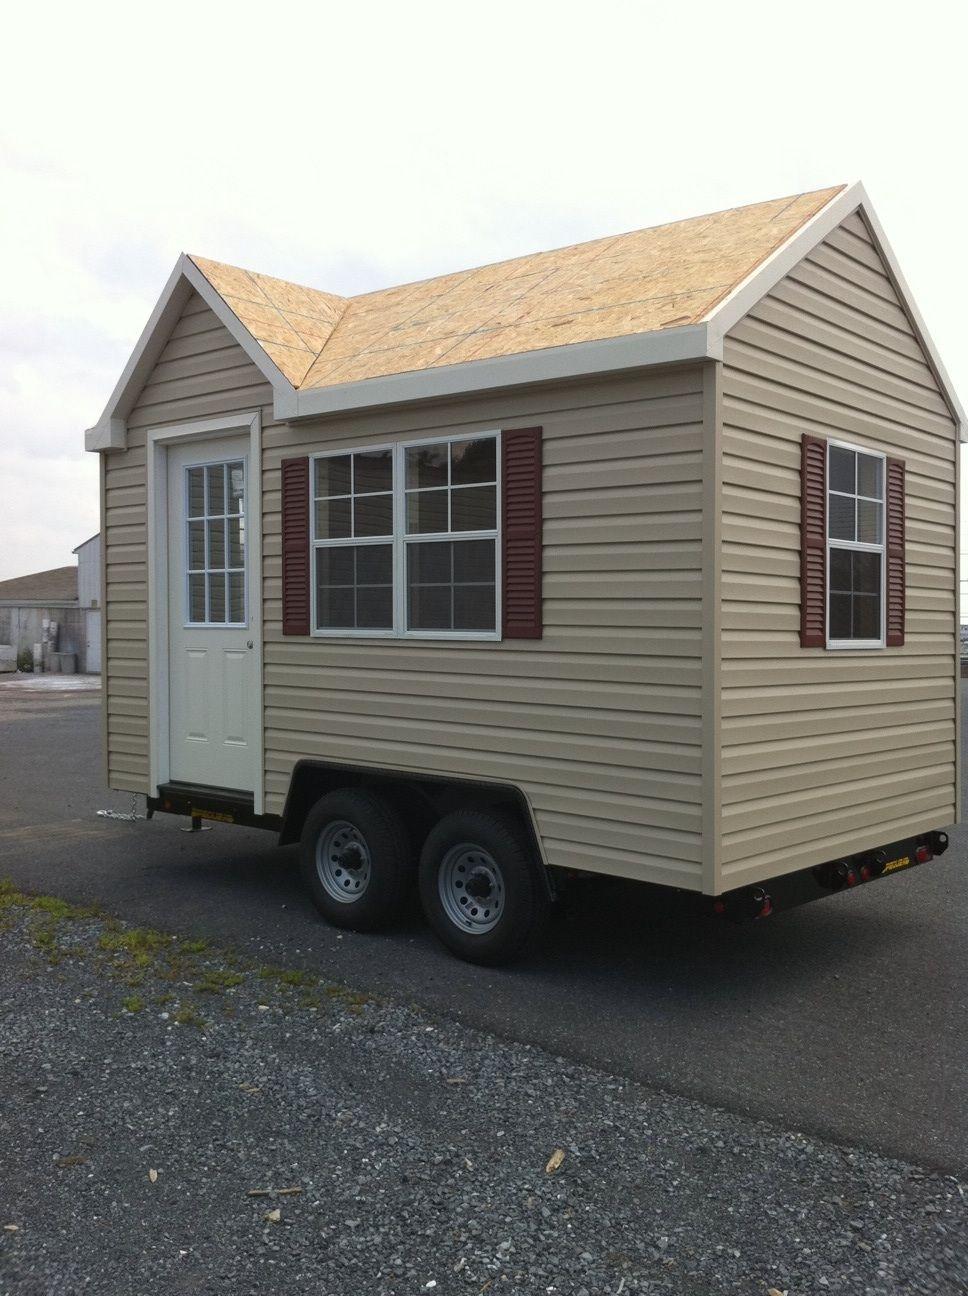 Custom Built Mobile Trailer Shed Shed Shed Floor Plans Recreational Vehicles